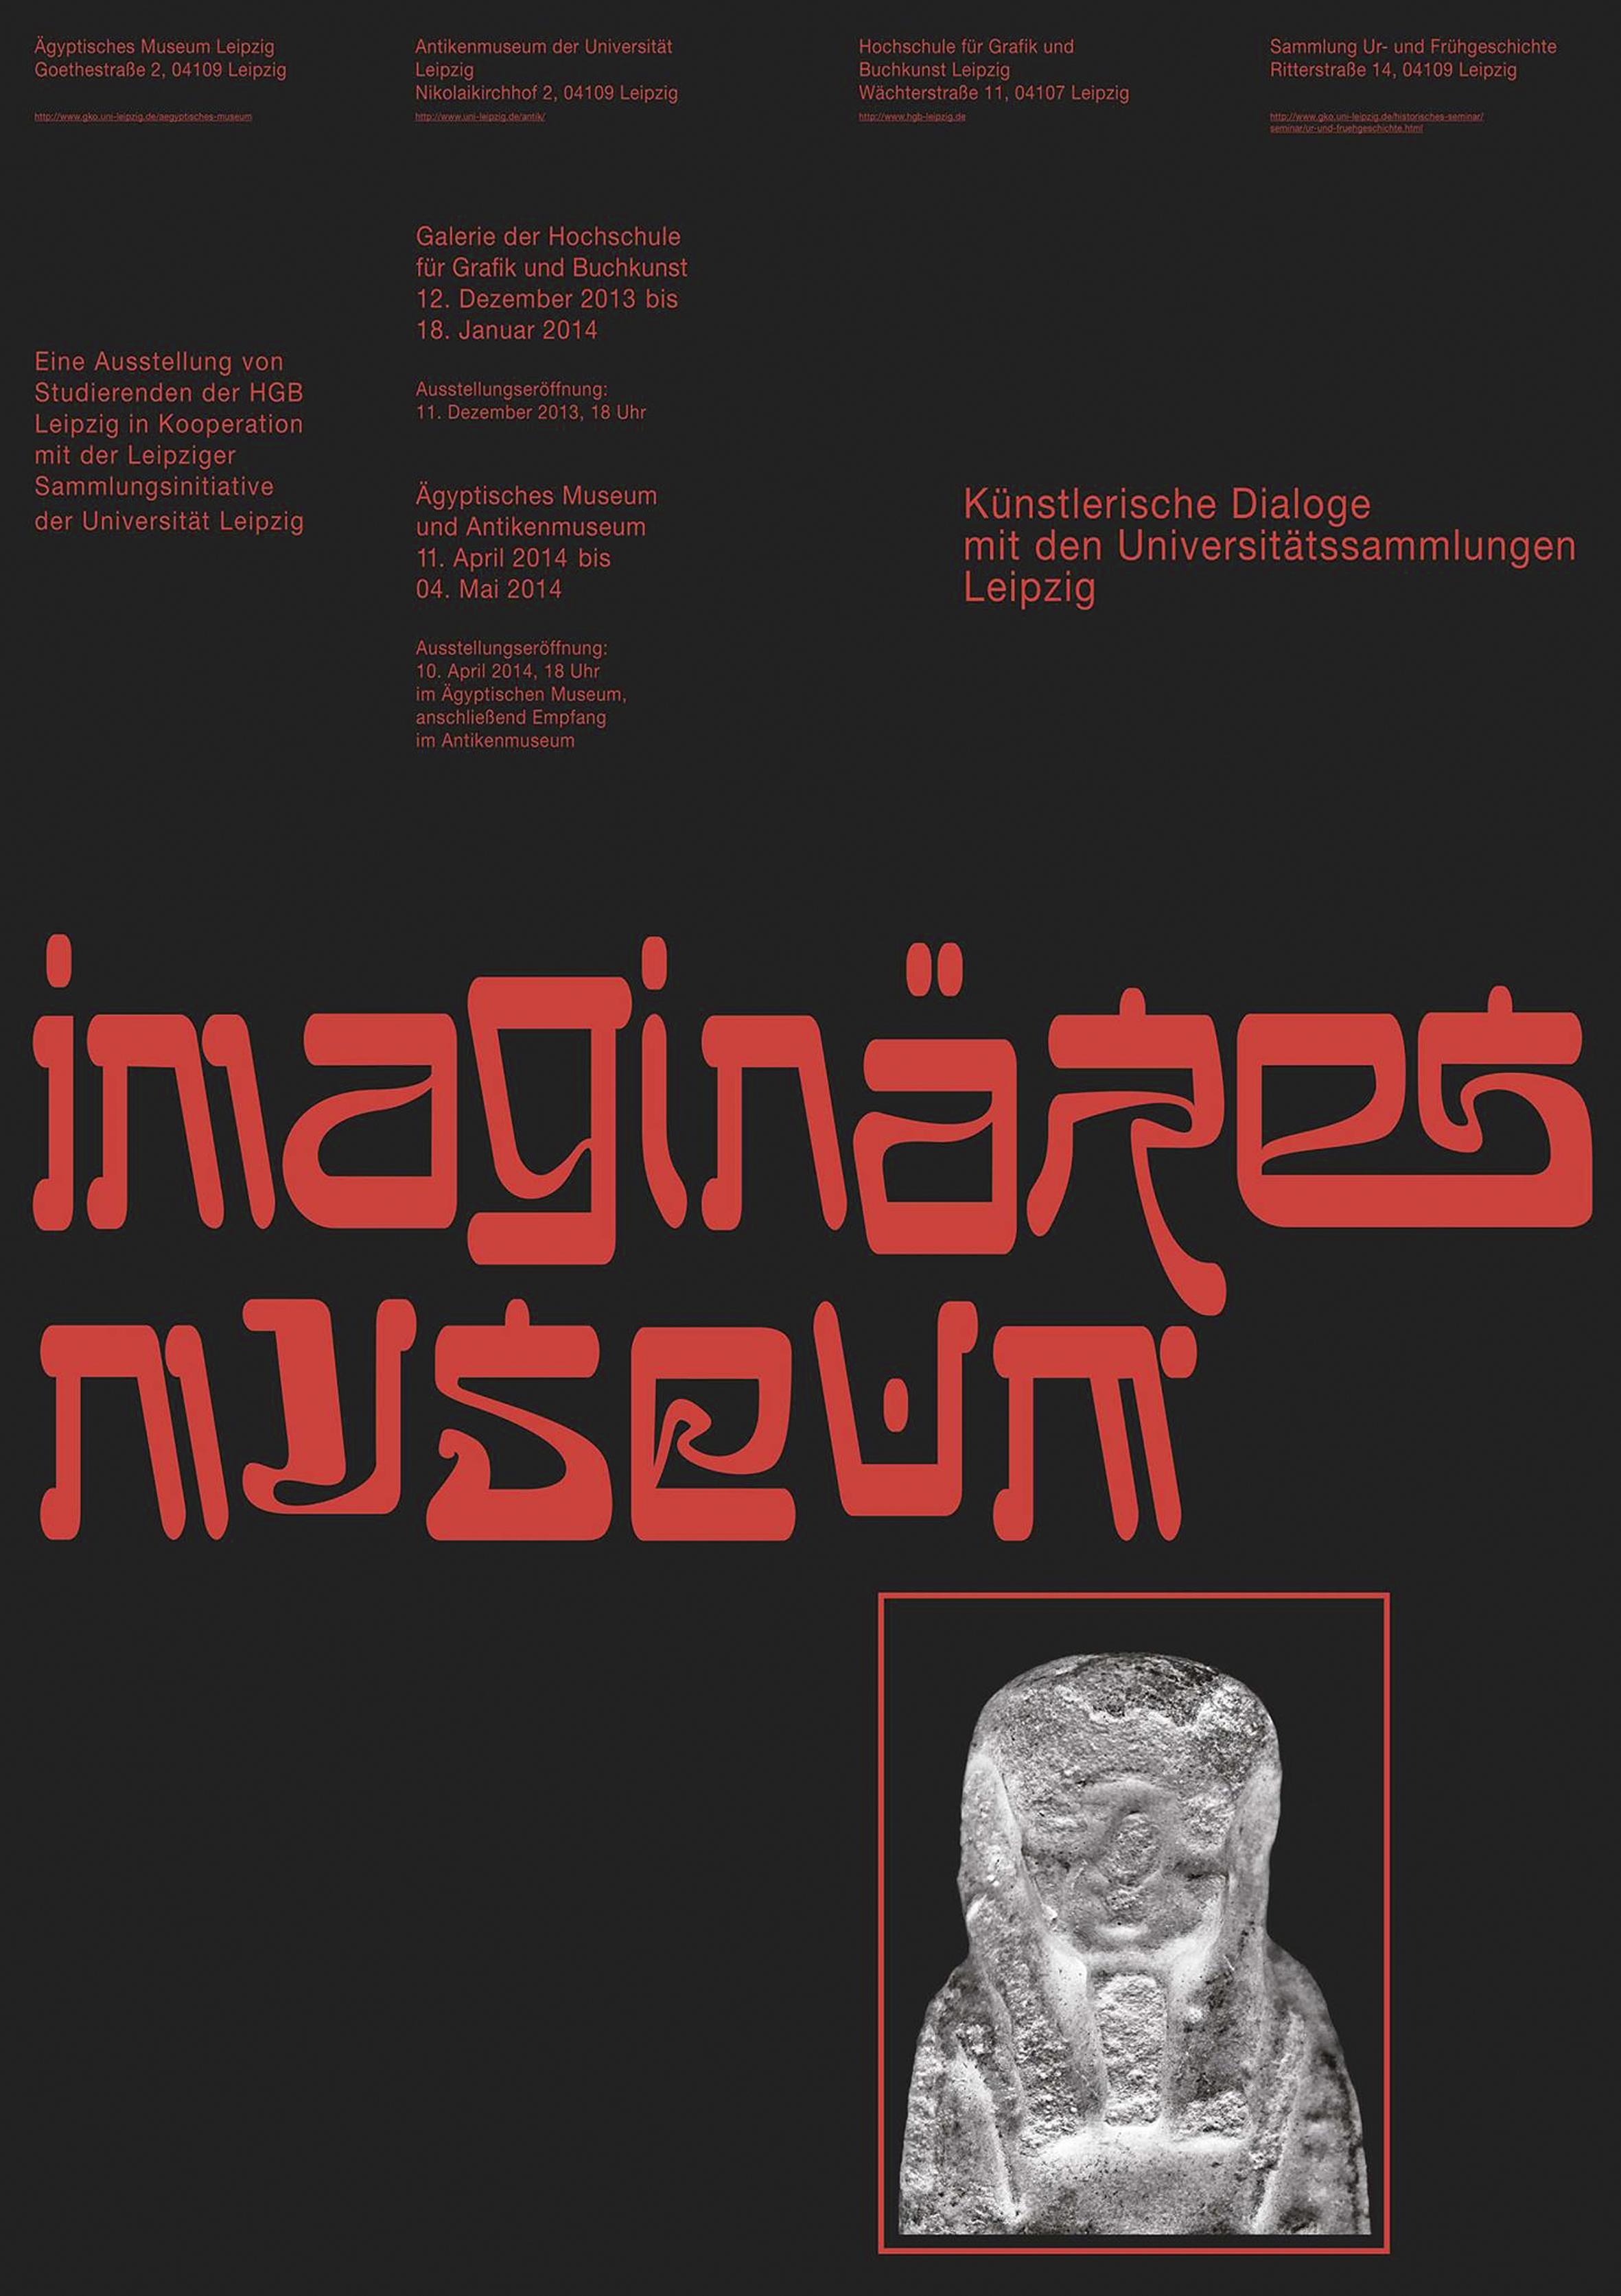 1- Imag. Museum Plakat